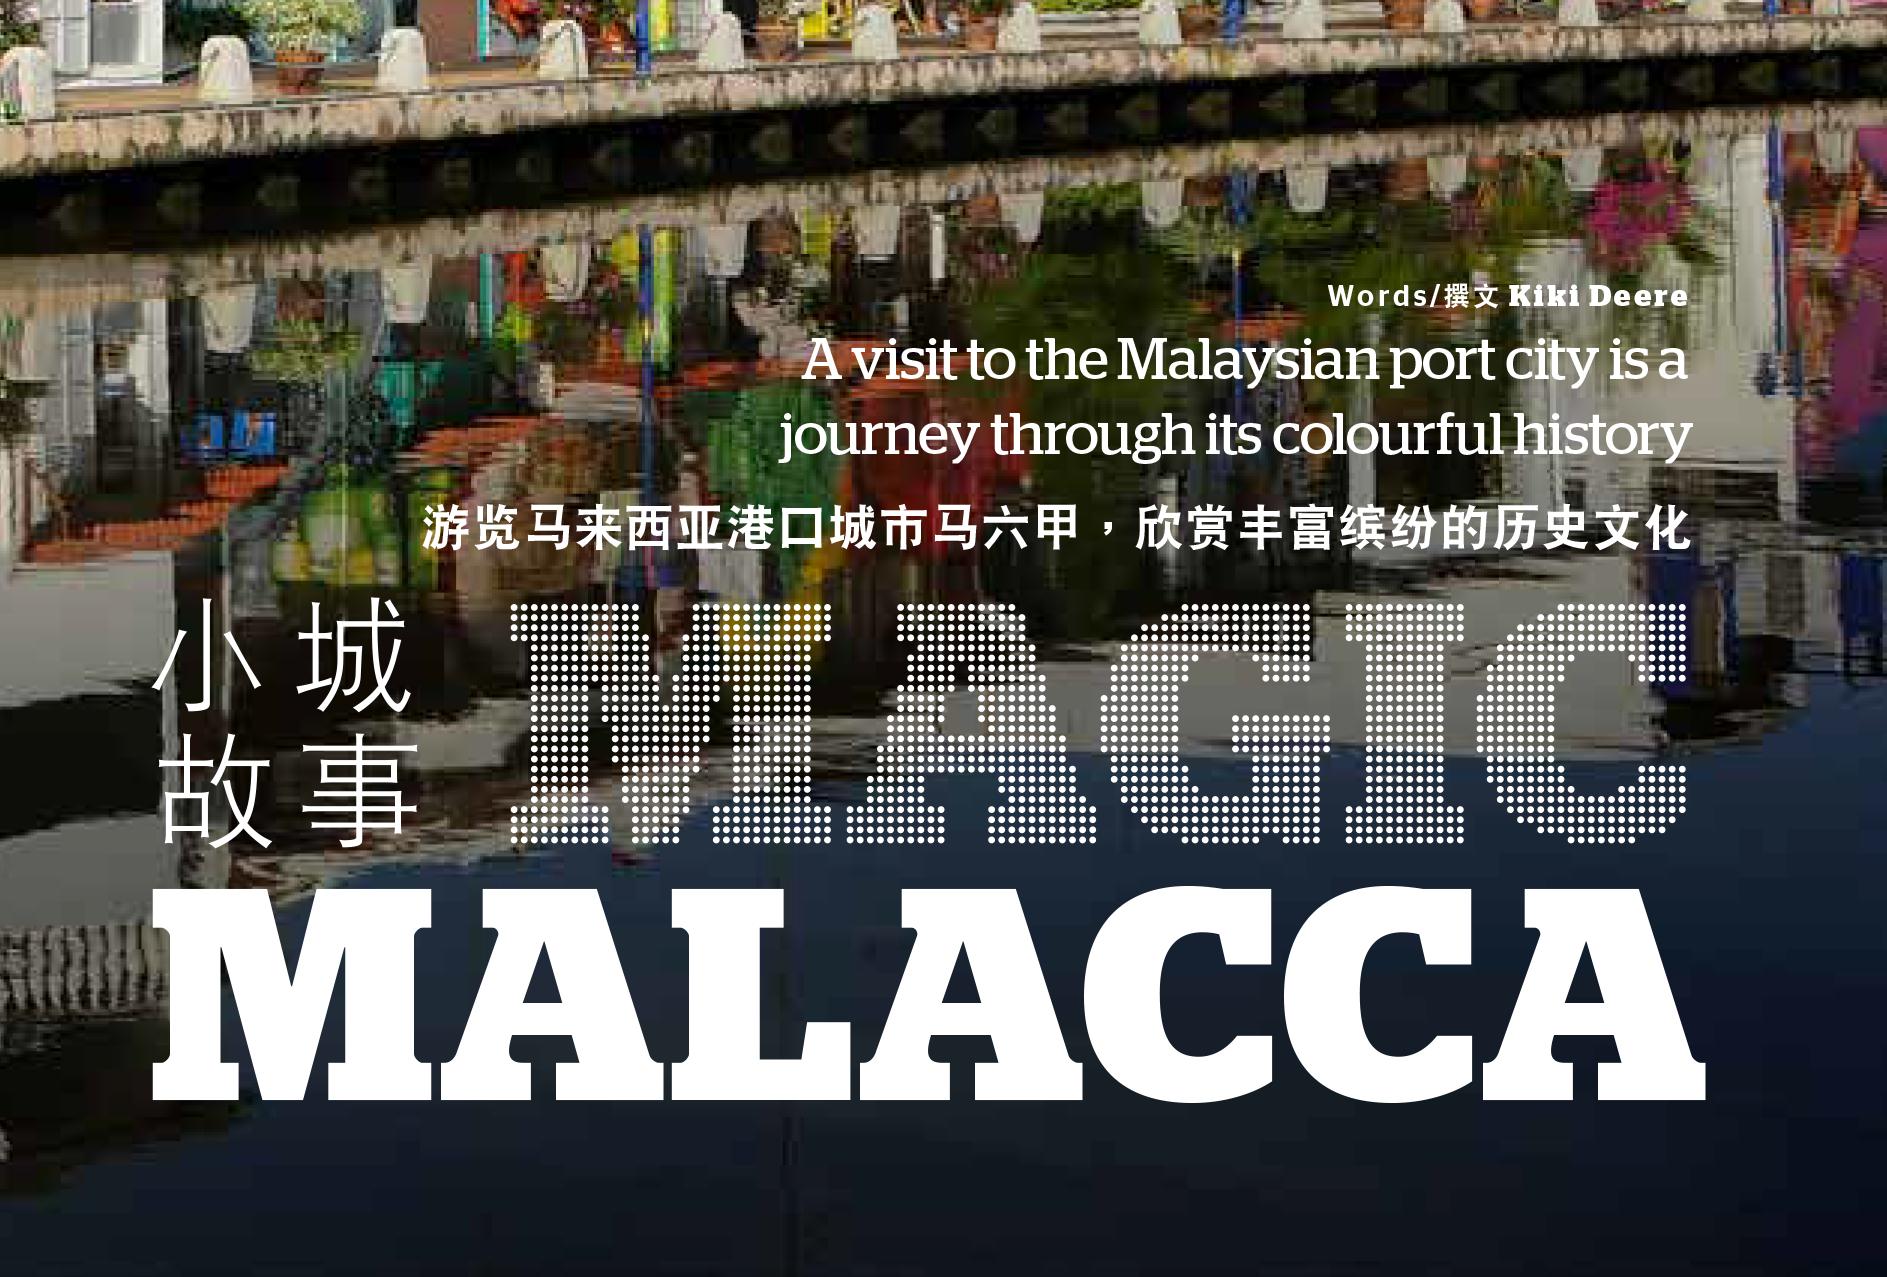 Magic Malacca